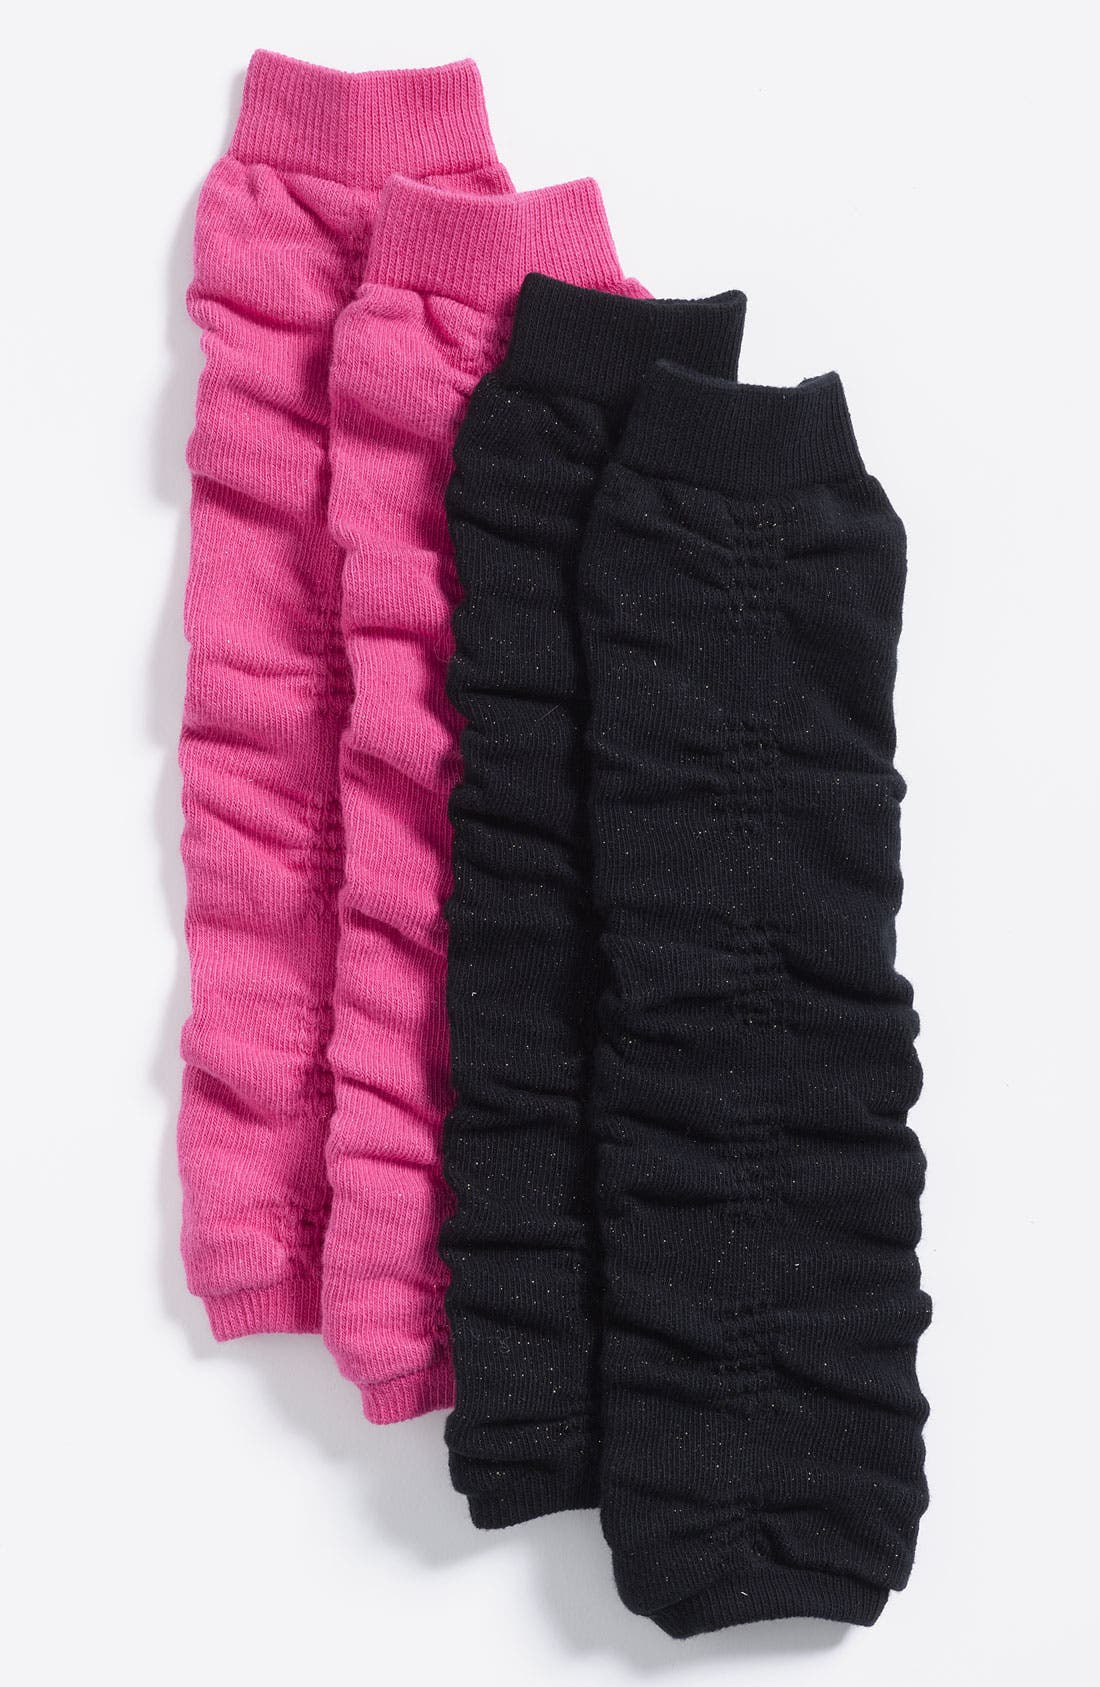 Alternate Image 1 Selected - Nordstrom Leg Warmers (2-Pack) (Girls)